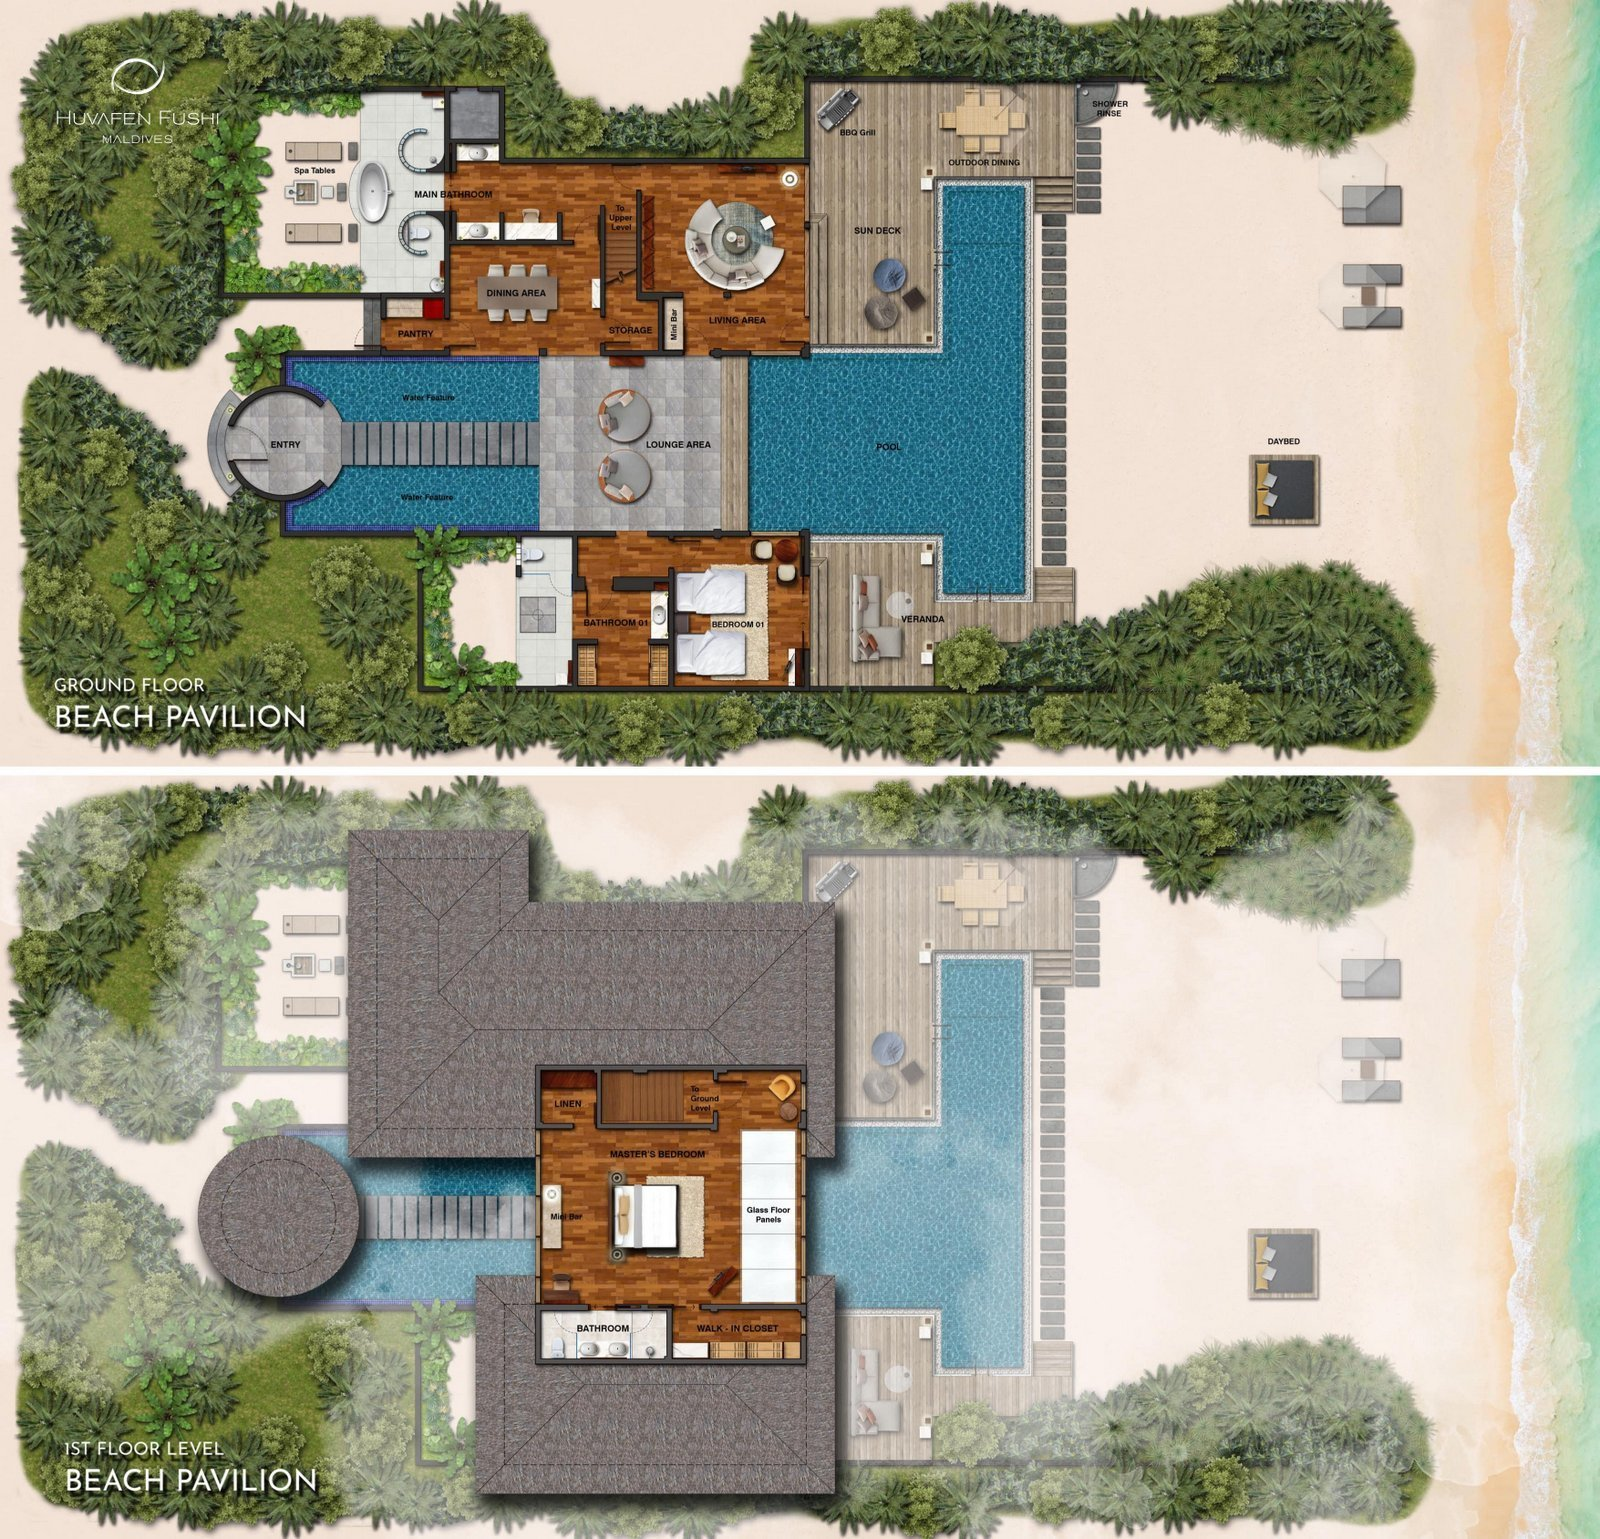 Мальдивы, отель Huvafen Fushi Maldives, план-схема номера Two Bed Room Beach Pavilion with Pool